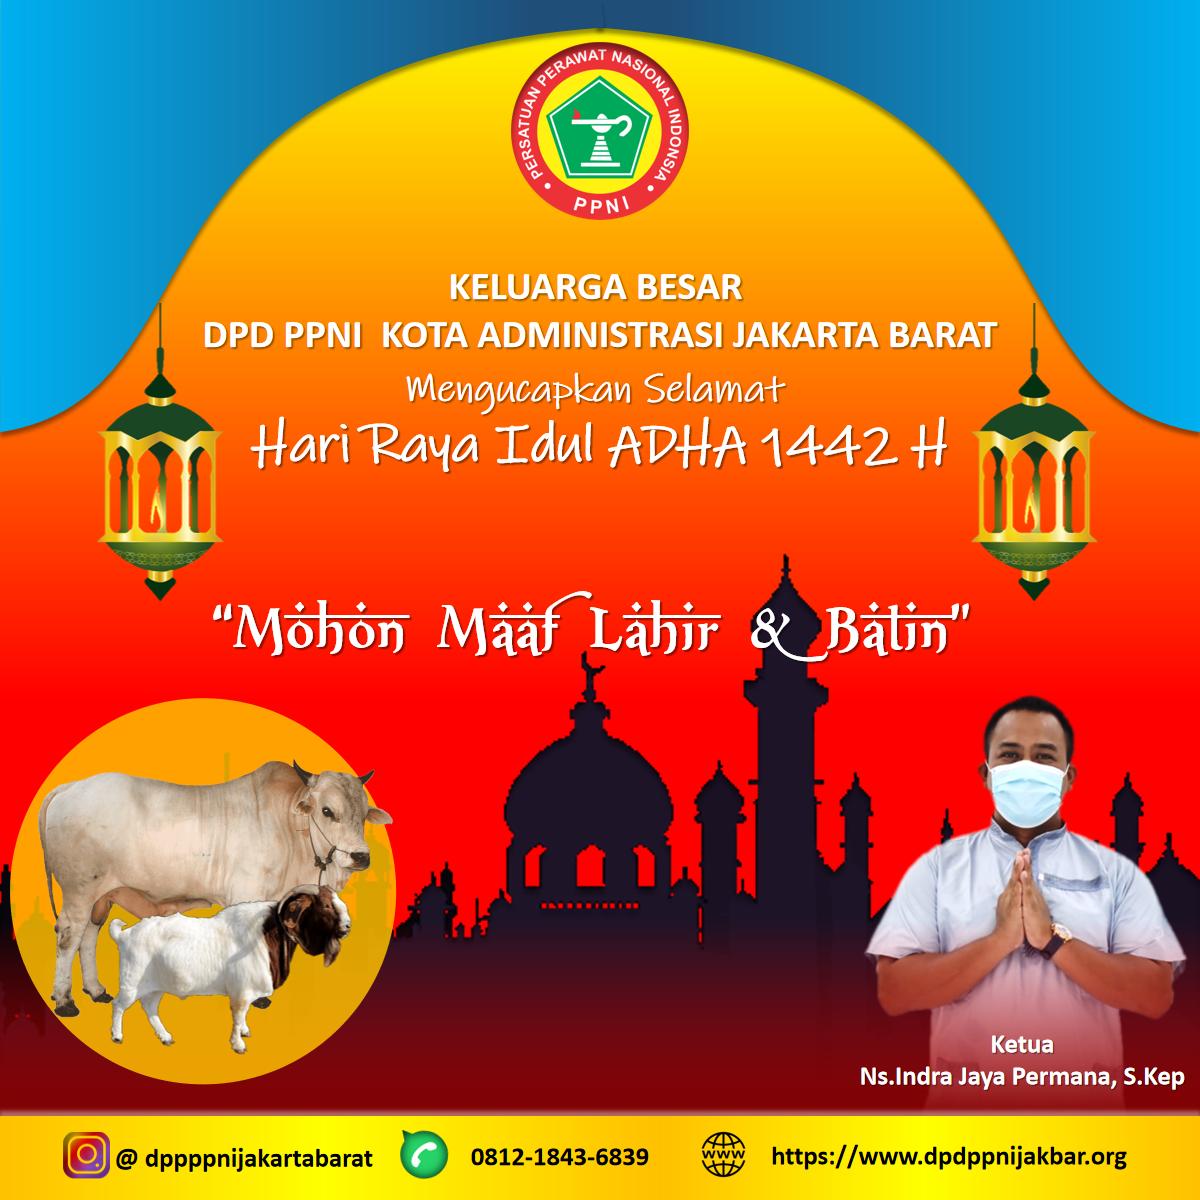 Idul Adha 1442 H